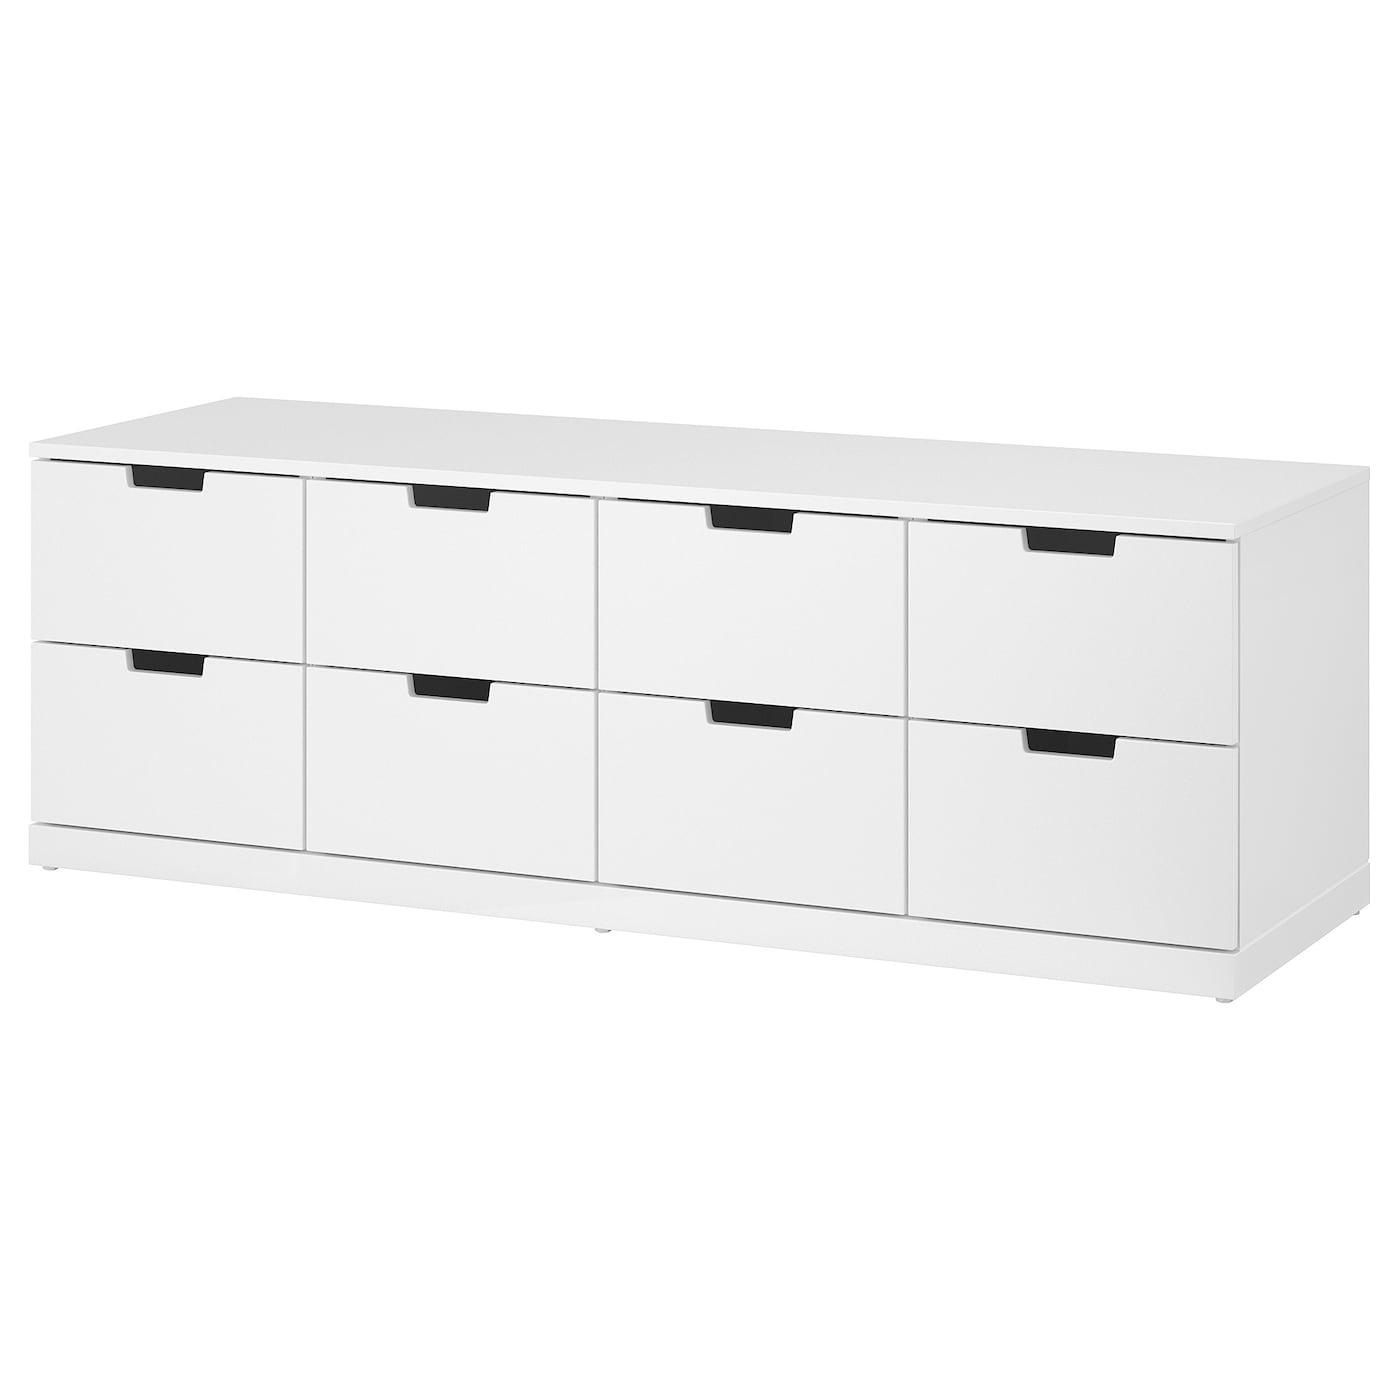 nordli commode 8 tiroirs blanc 160x54 cm ikea. Black Bedroom Furniture Sets. Home Design Ideas